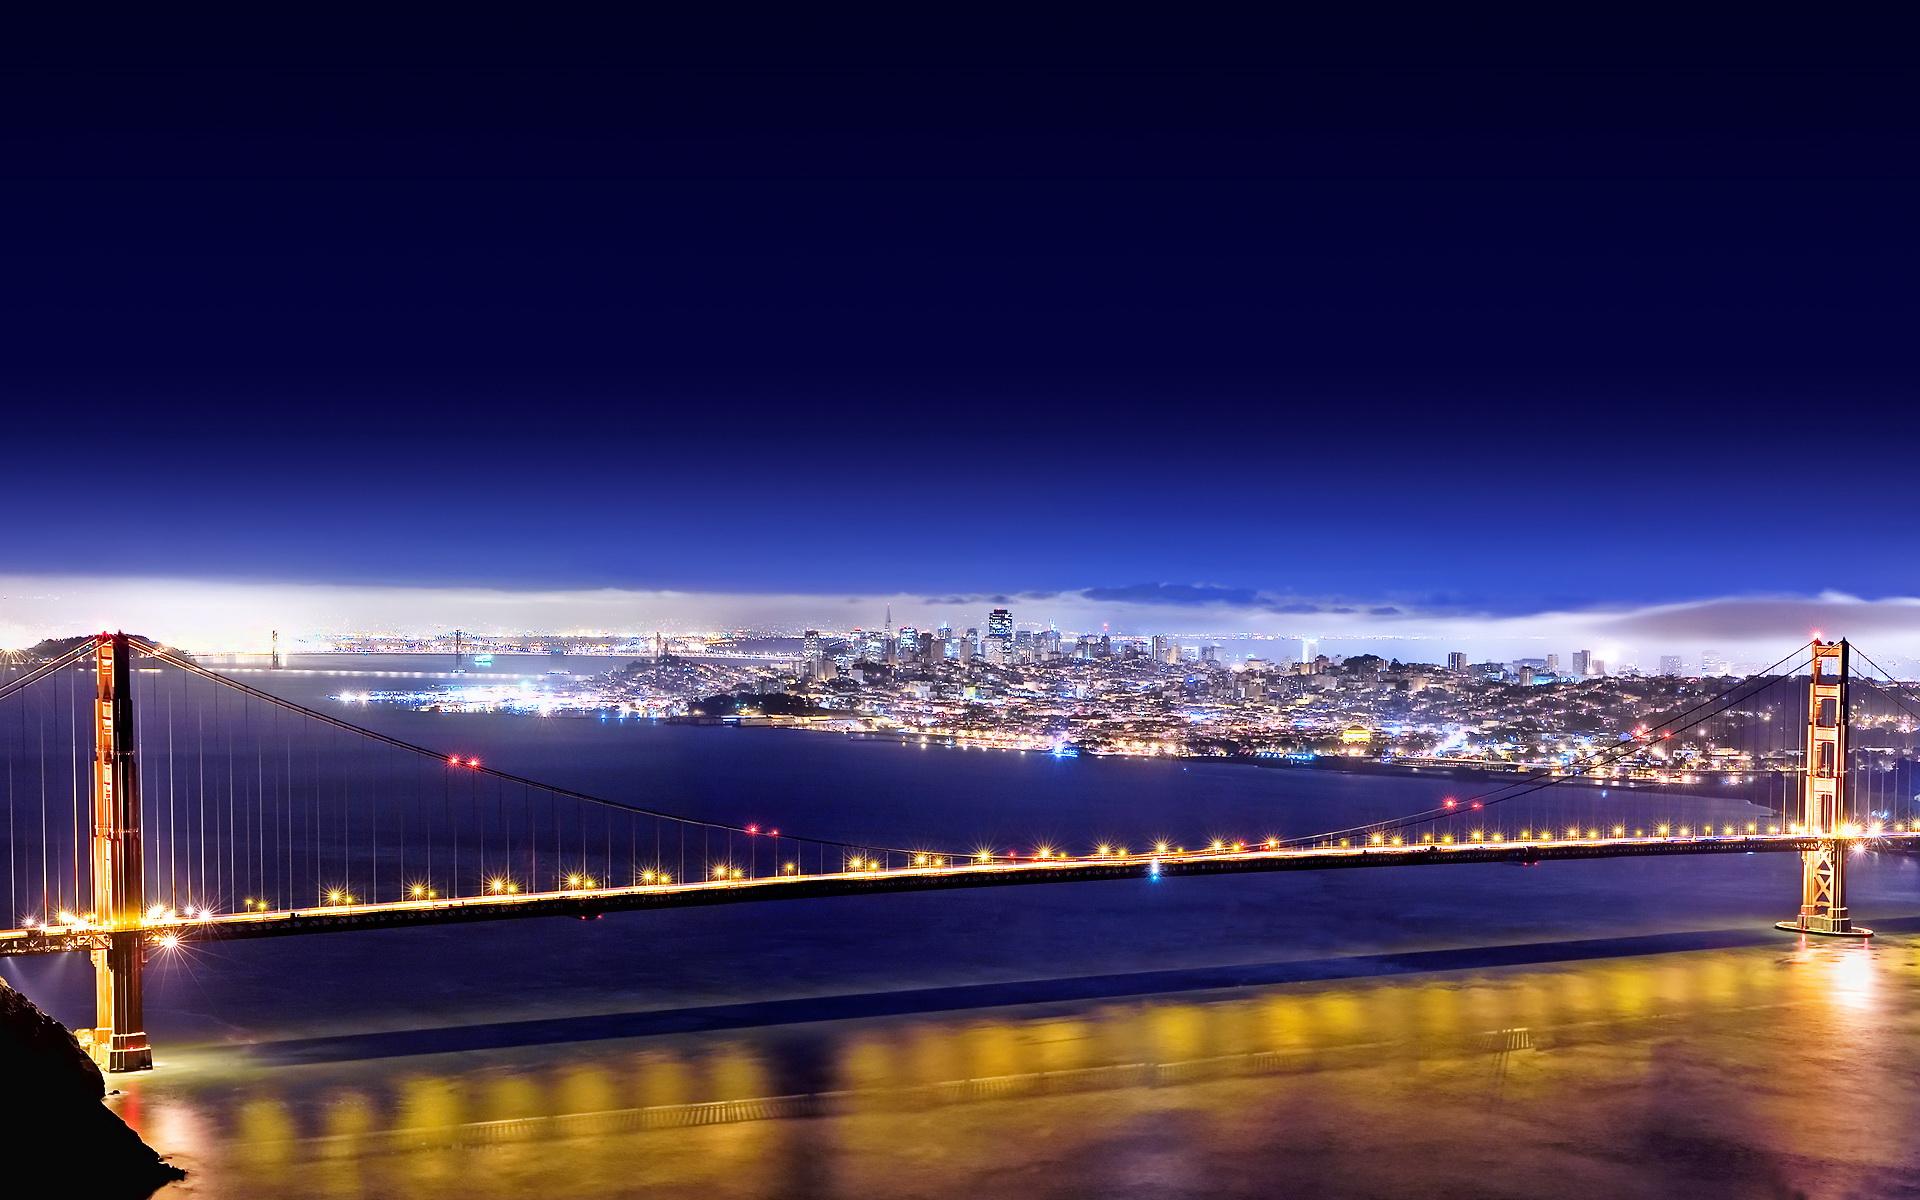 Мост огни ночь  № 3716513 без смс